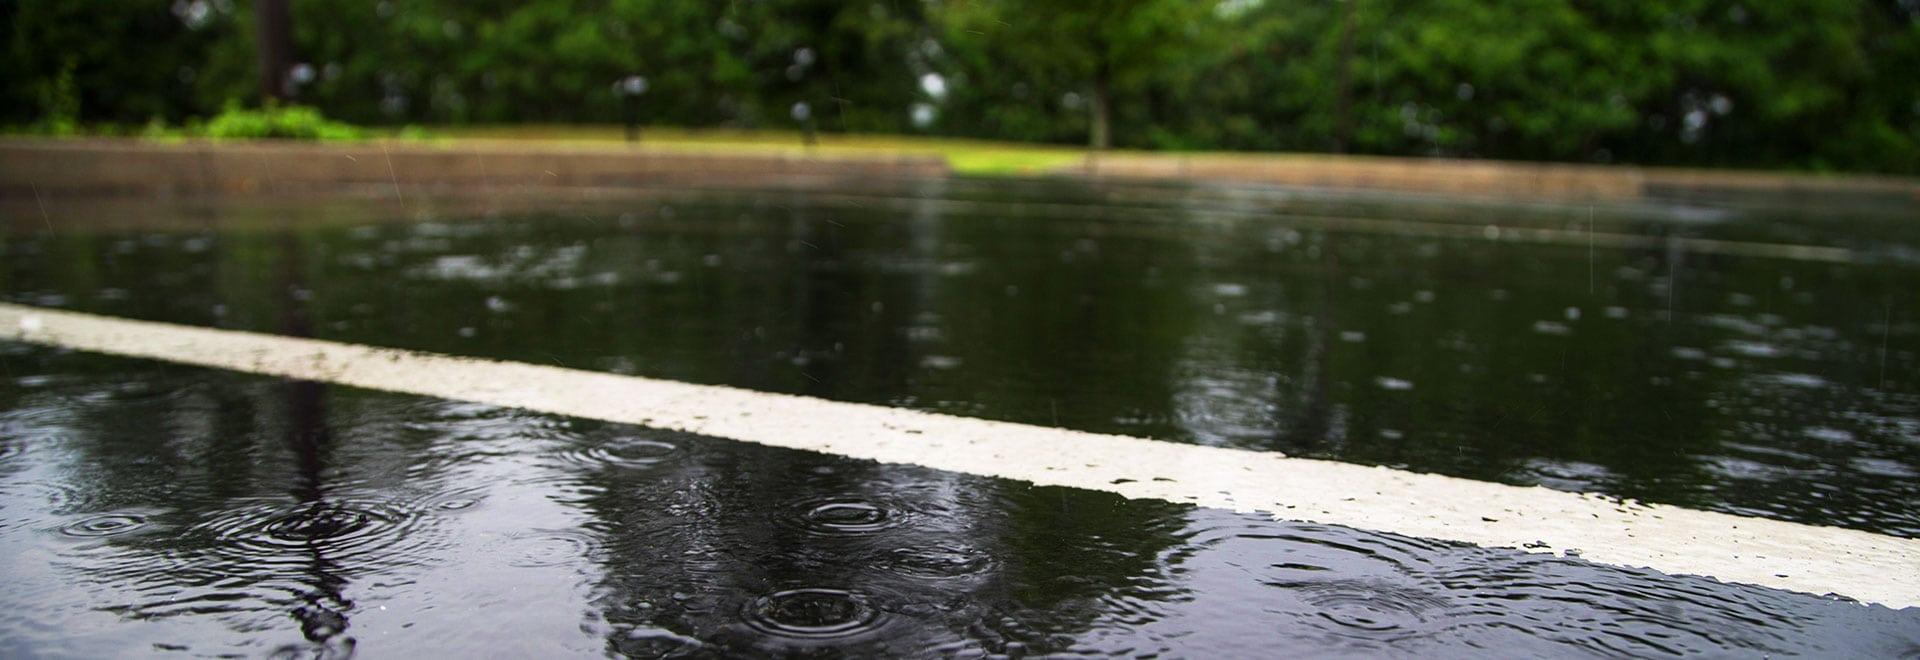 StormTank solutions for rainwater runoff